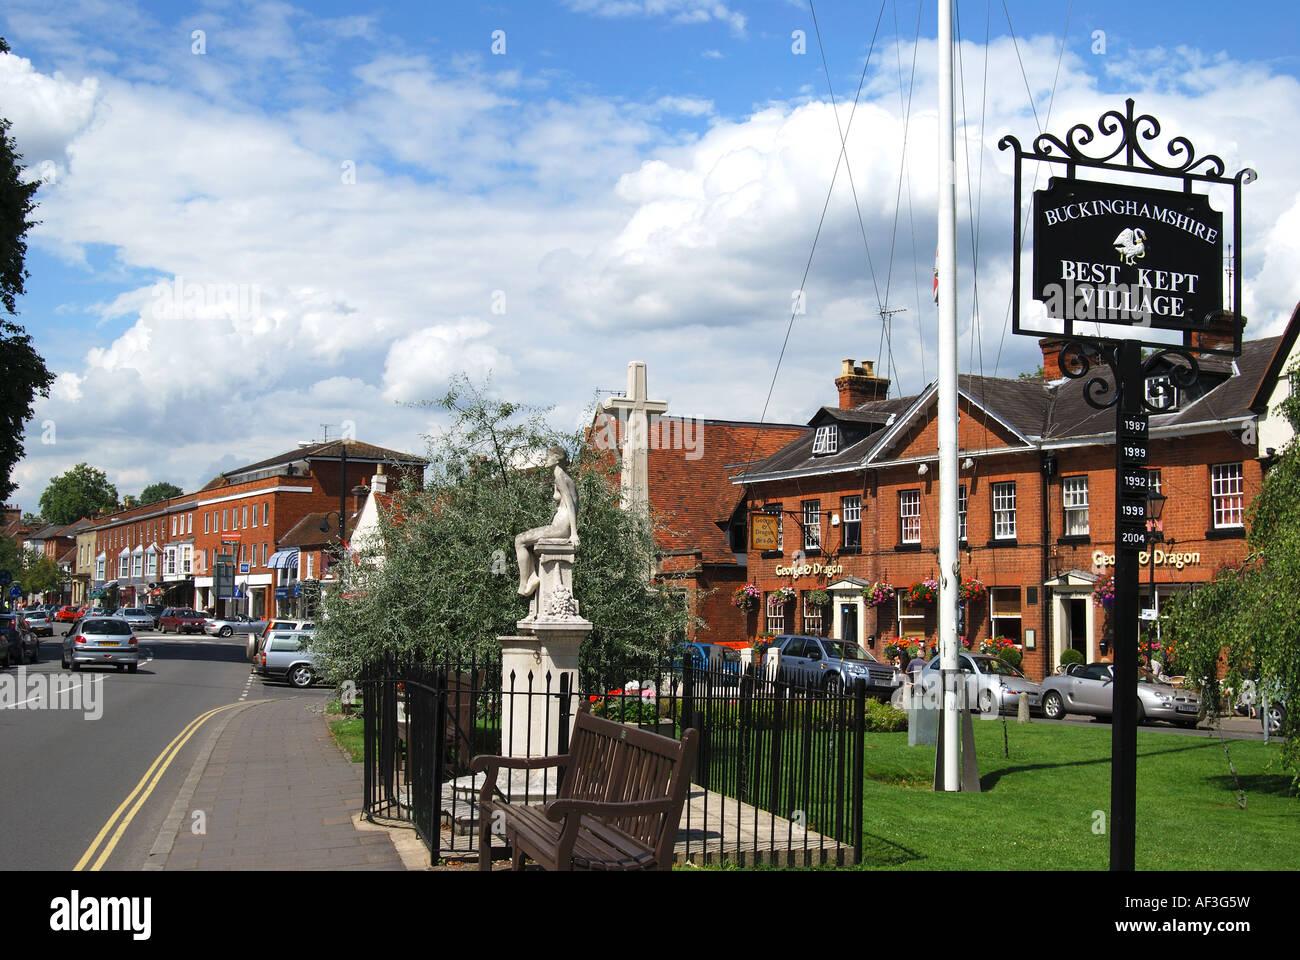 High Street, Marlow, Buckinghamshire, England, United Kingdom Stock Photo